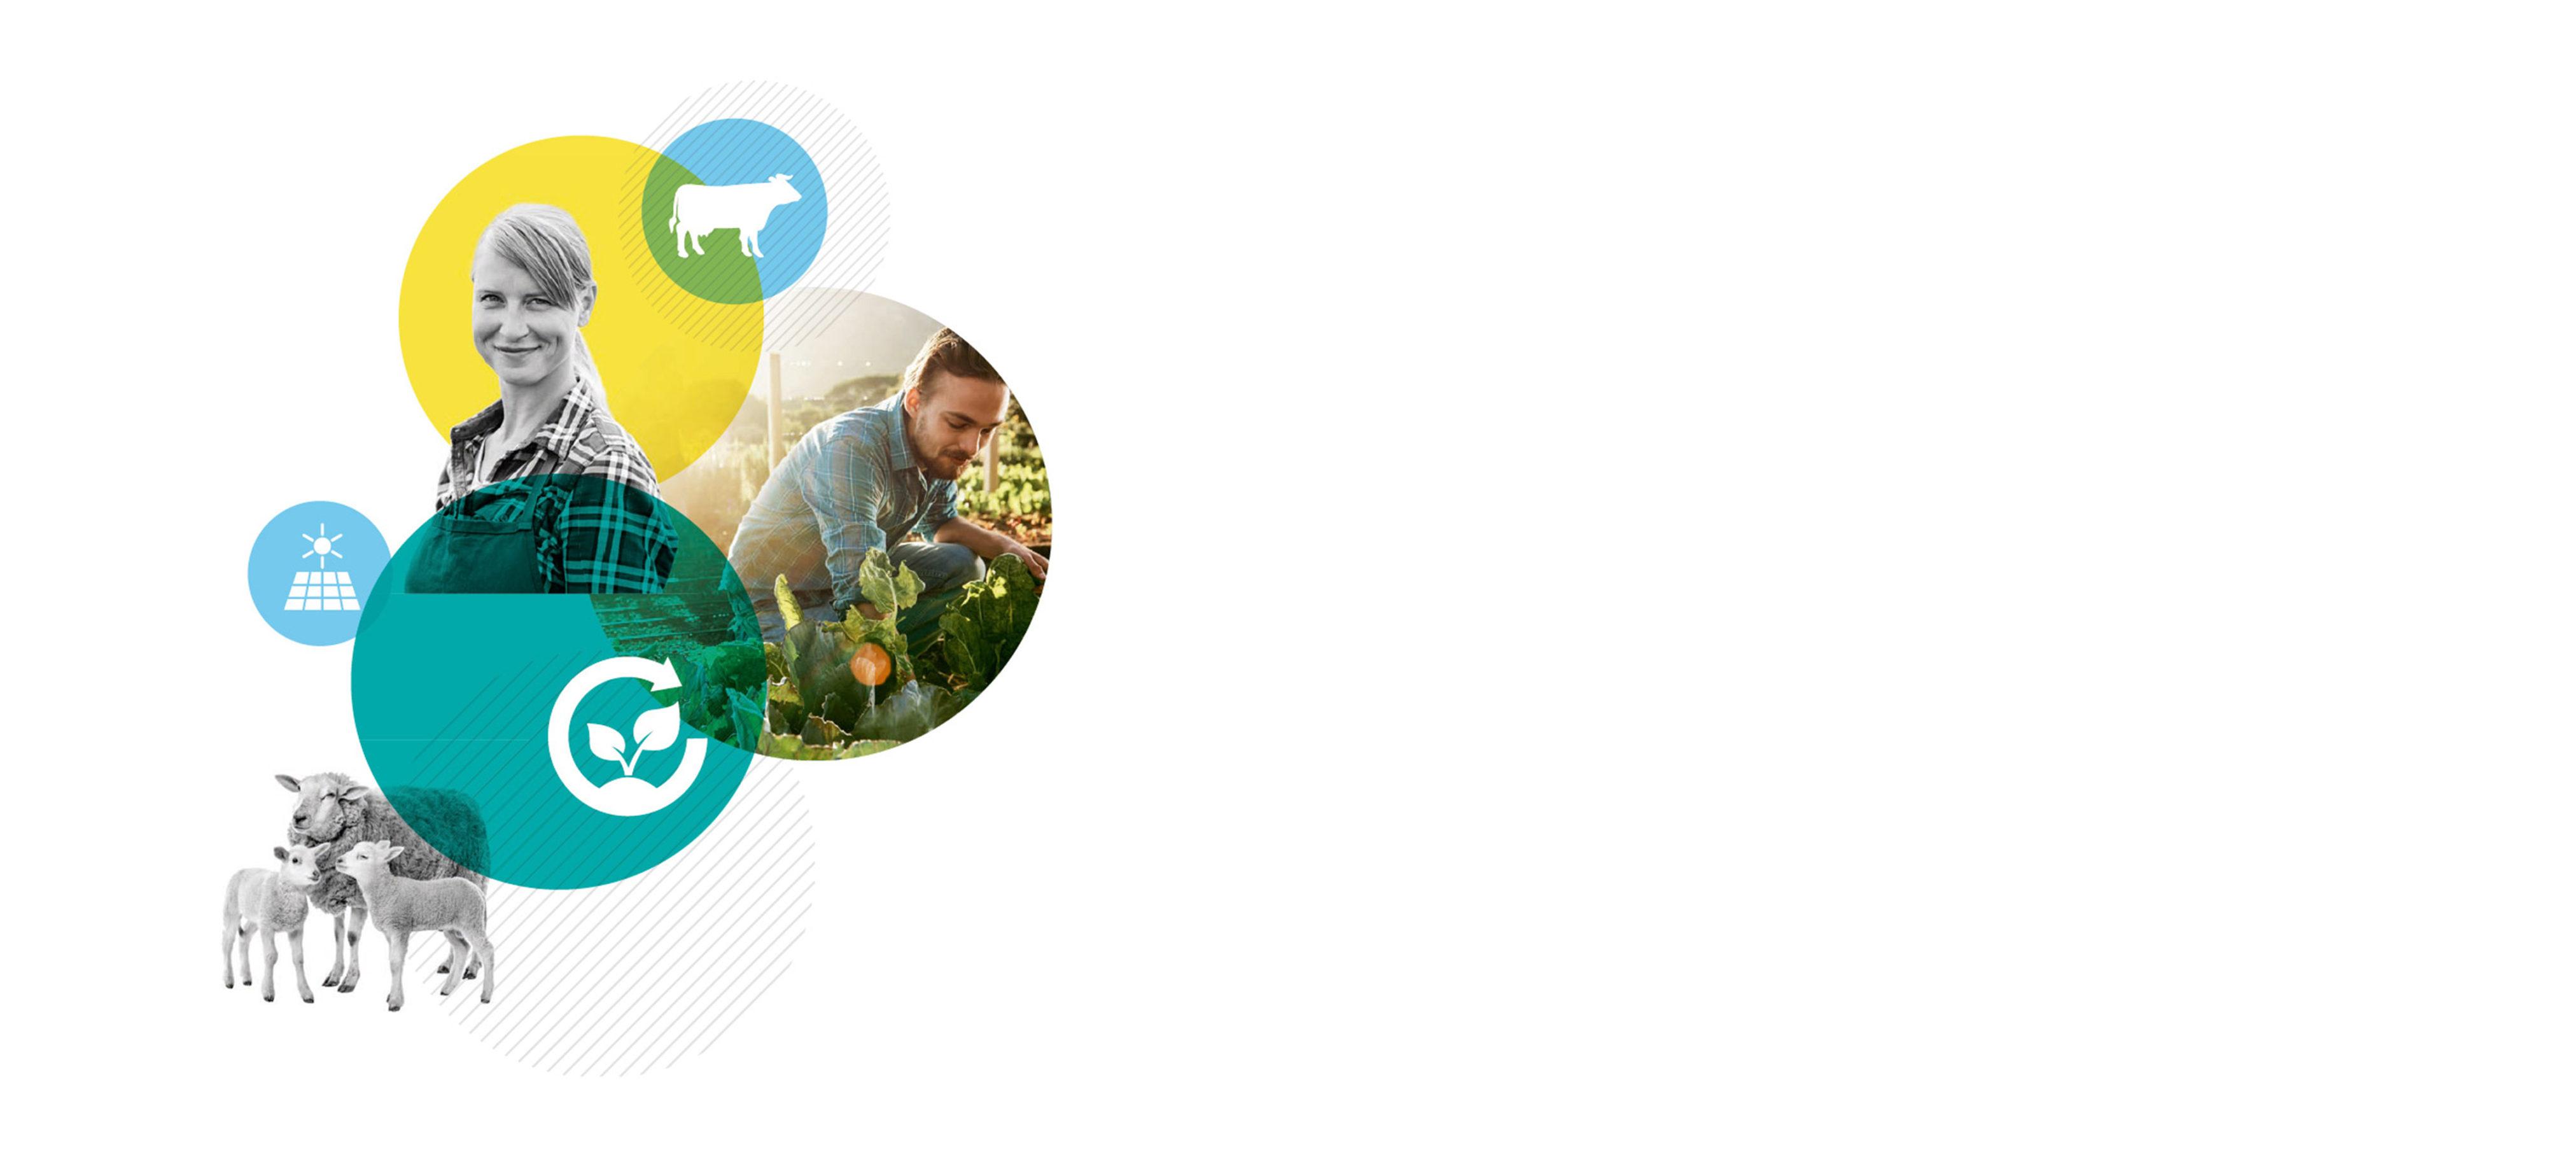 Actions & perspectives : rapport annuel 2019 de la FNSEA